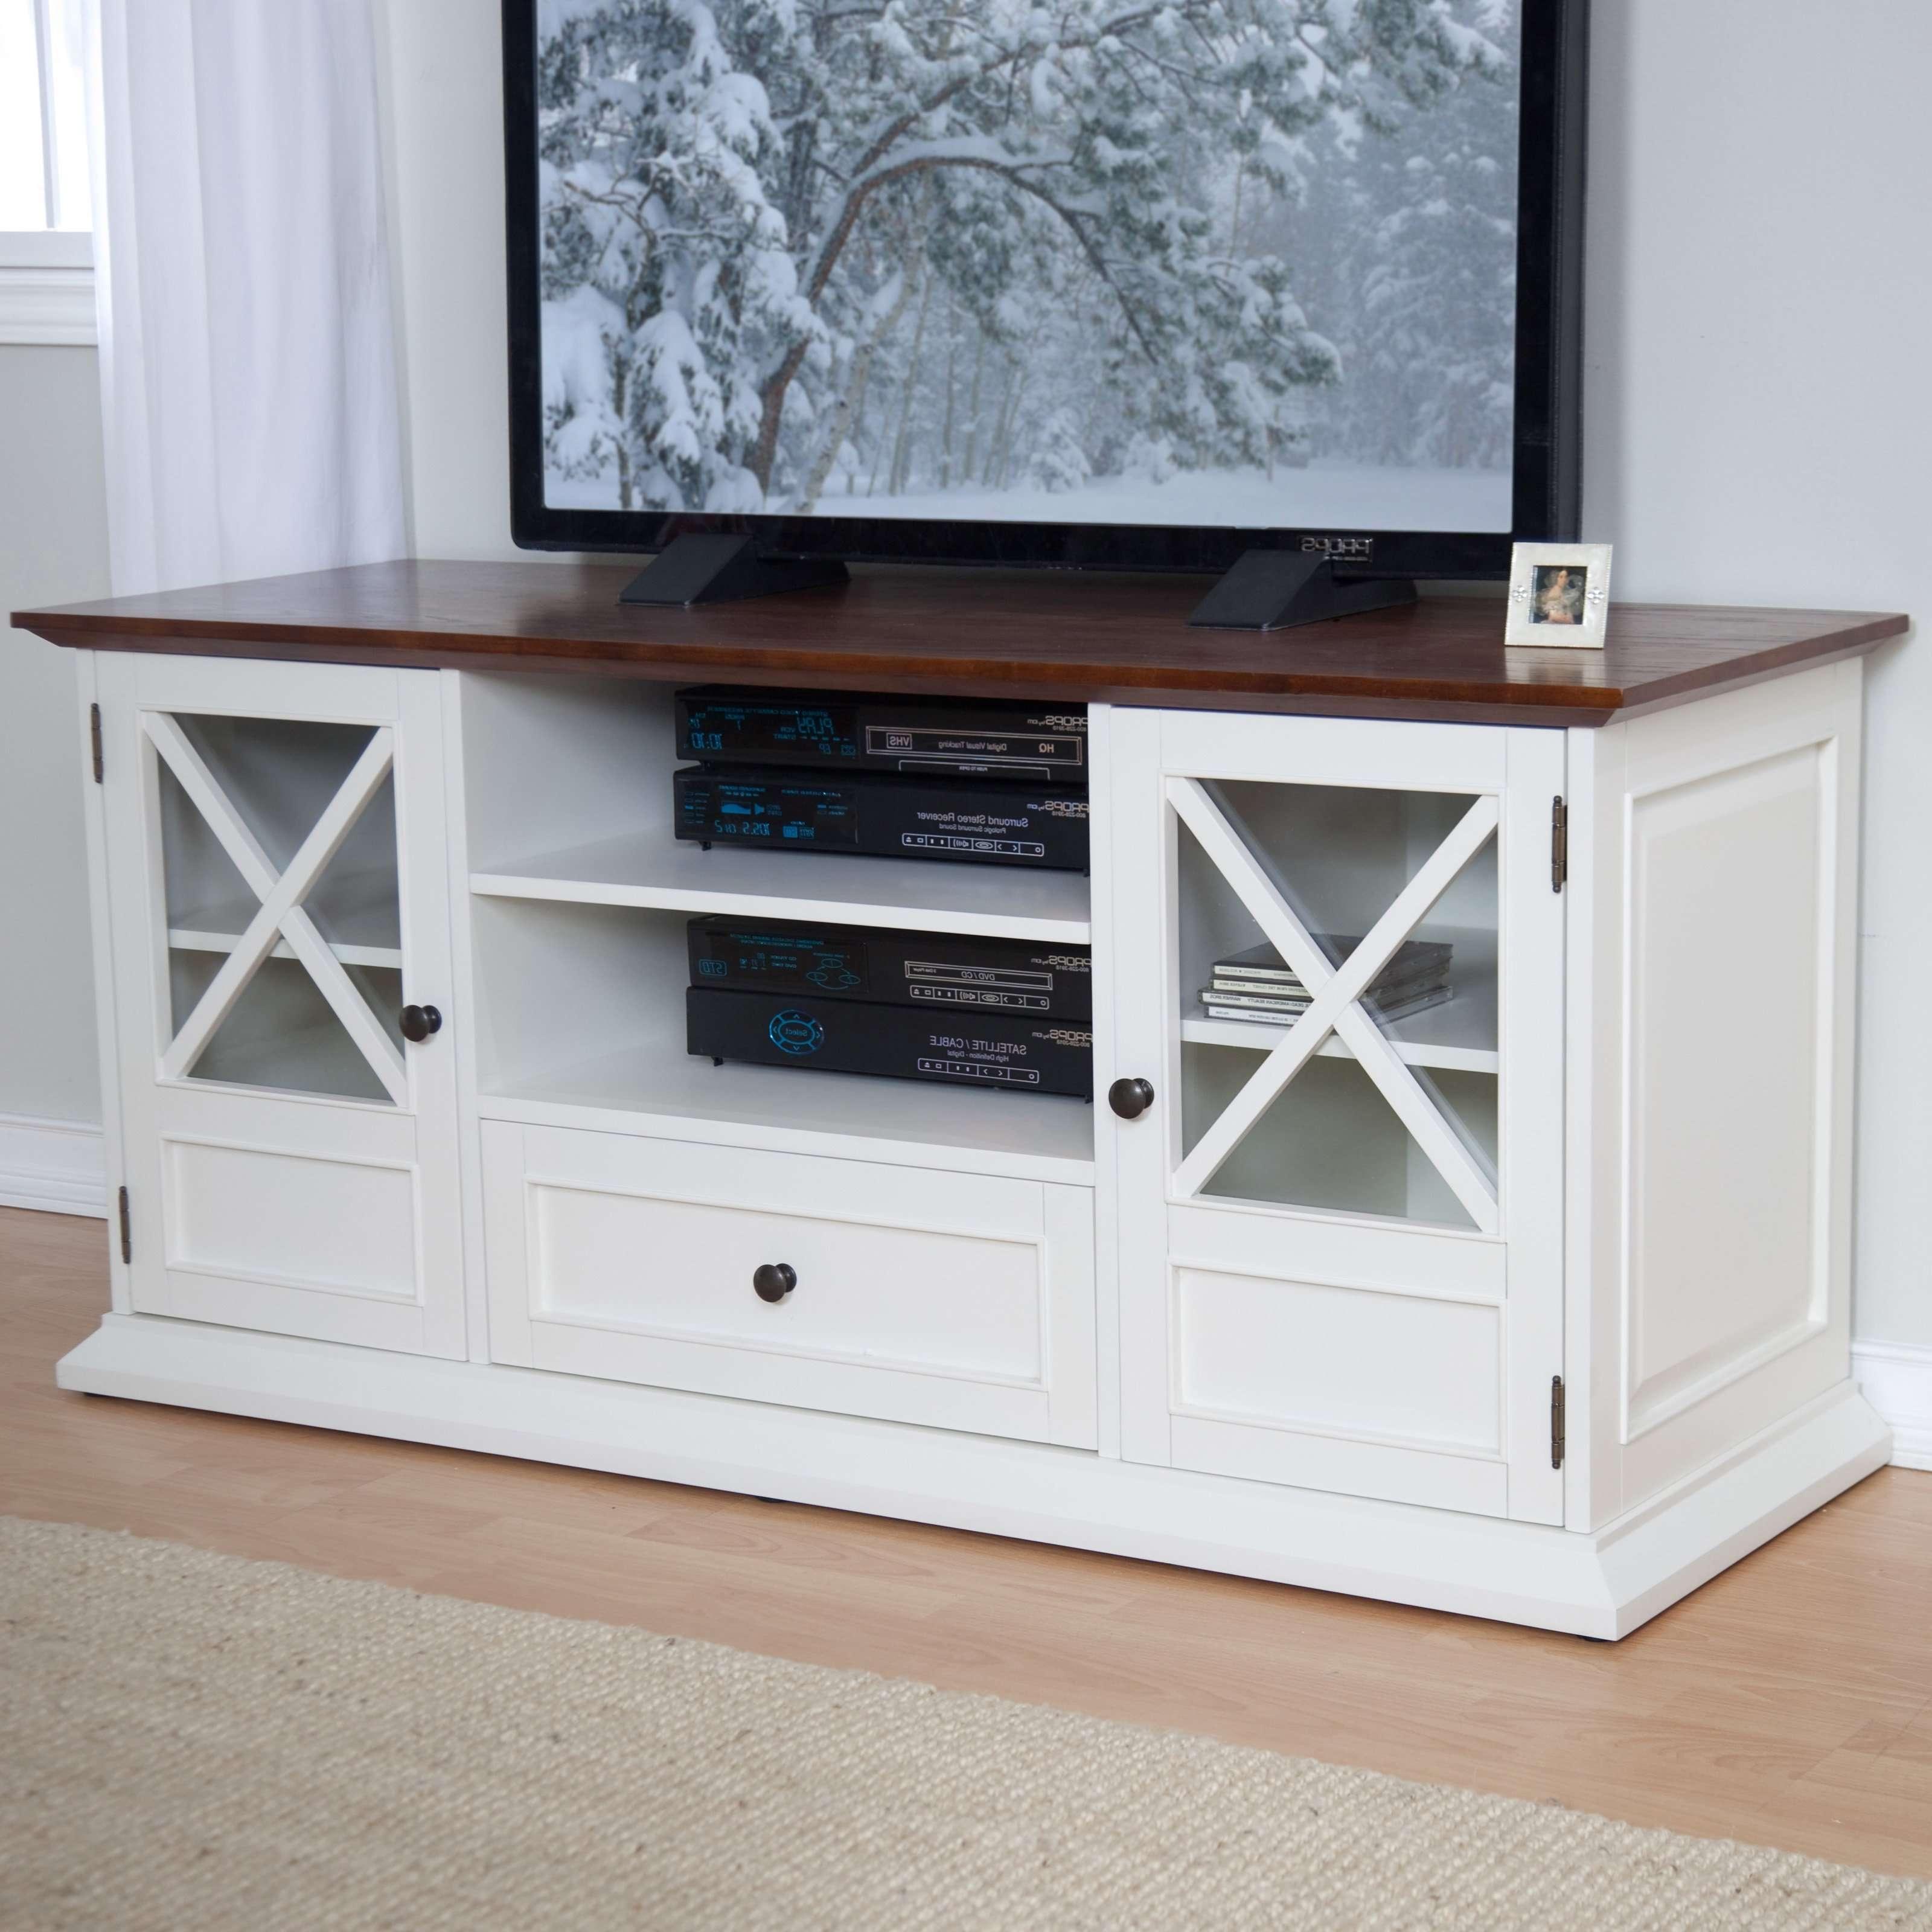 Belham Living Hampton Tv Stand – White/oak   Hayneedle Inside White Tv Cabinets (View 2 of 20)